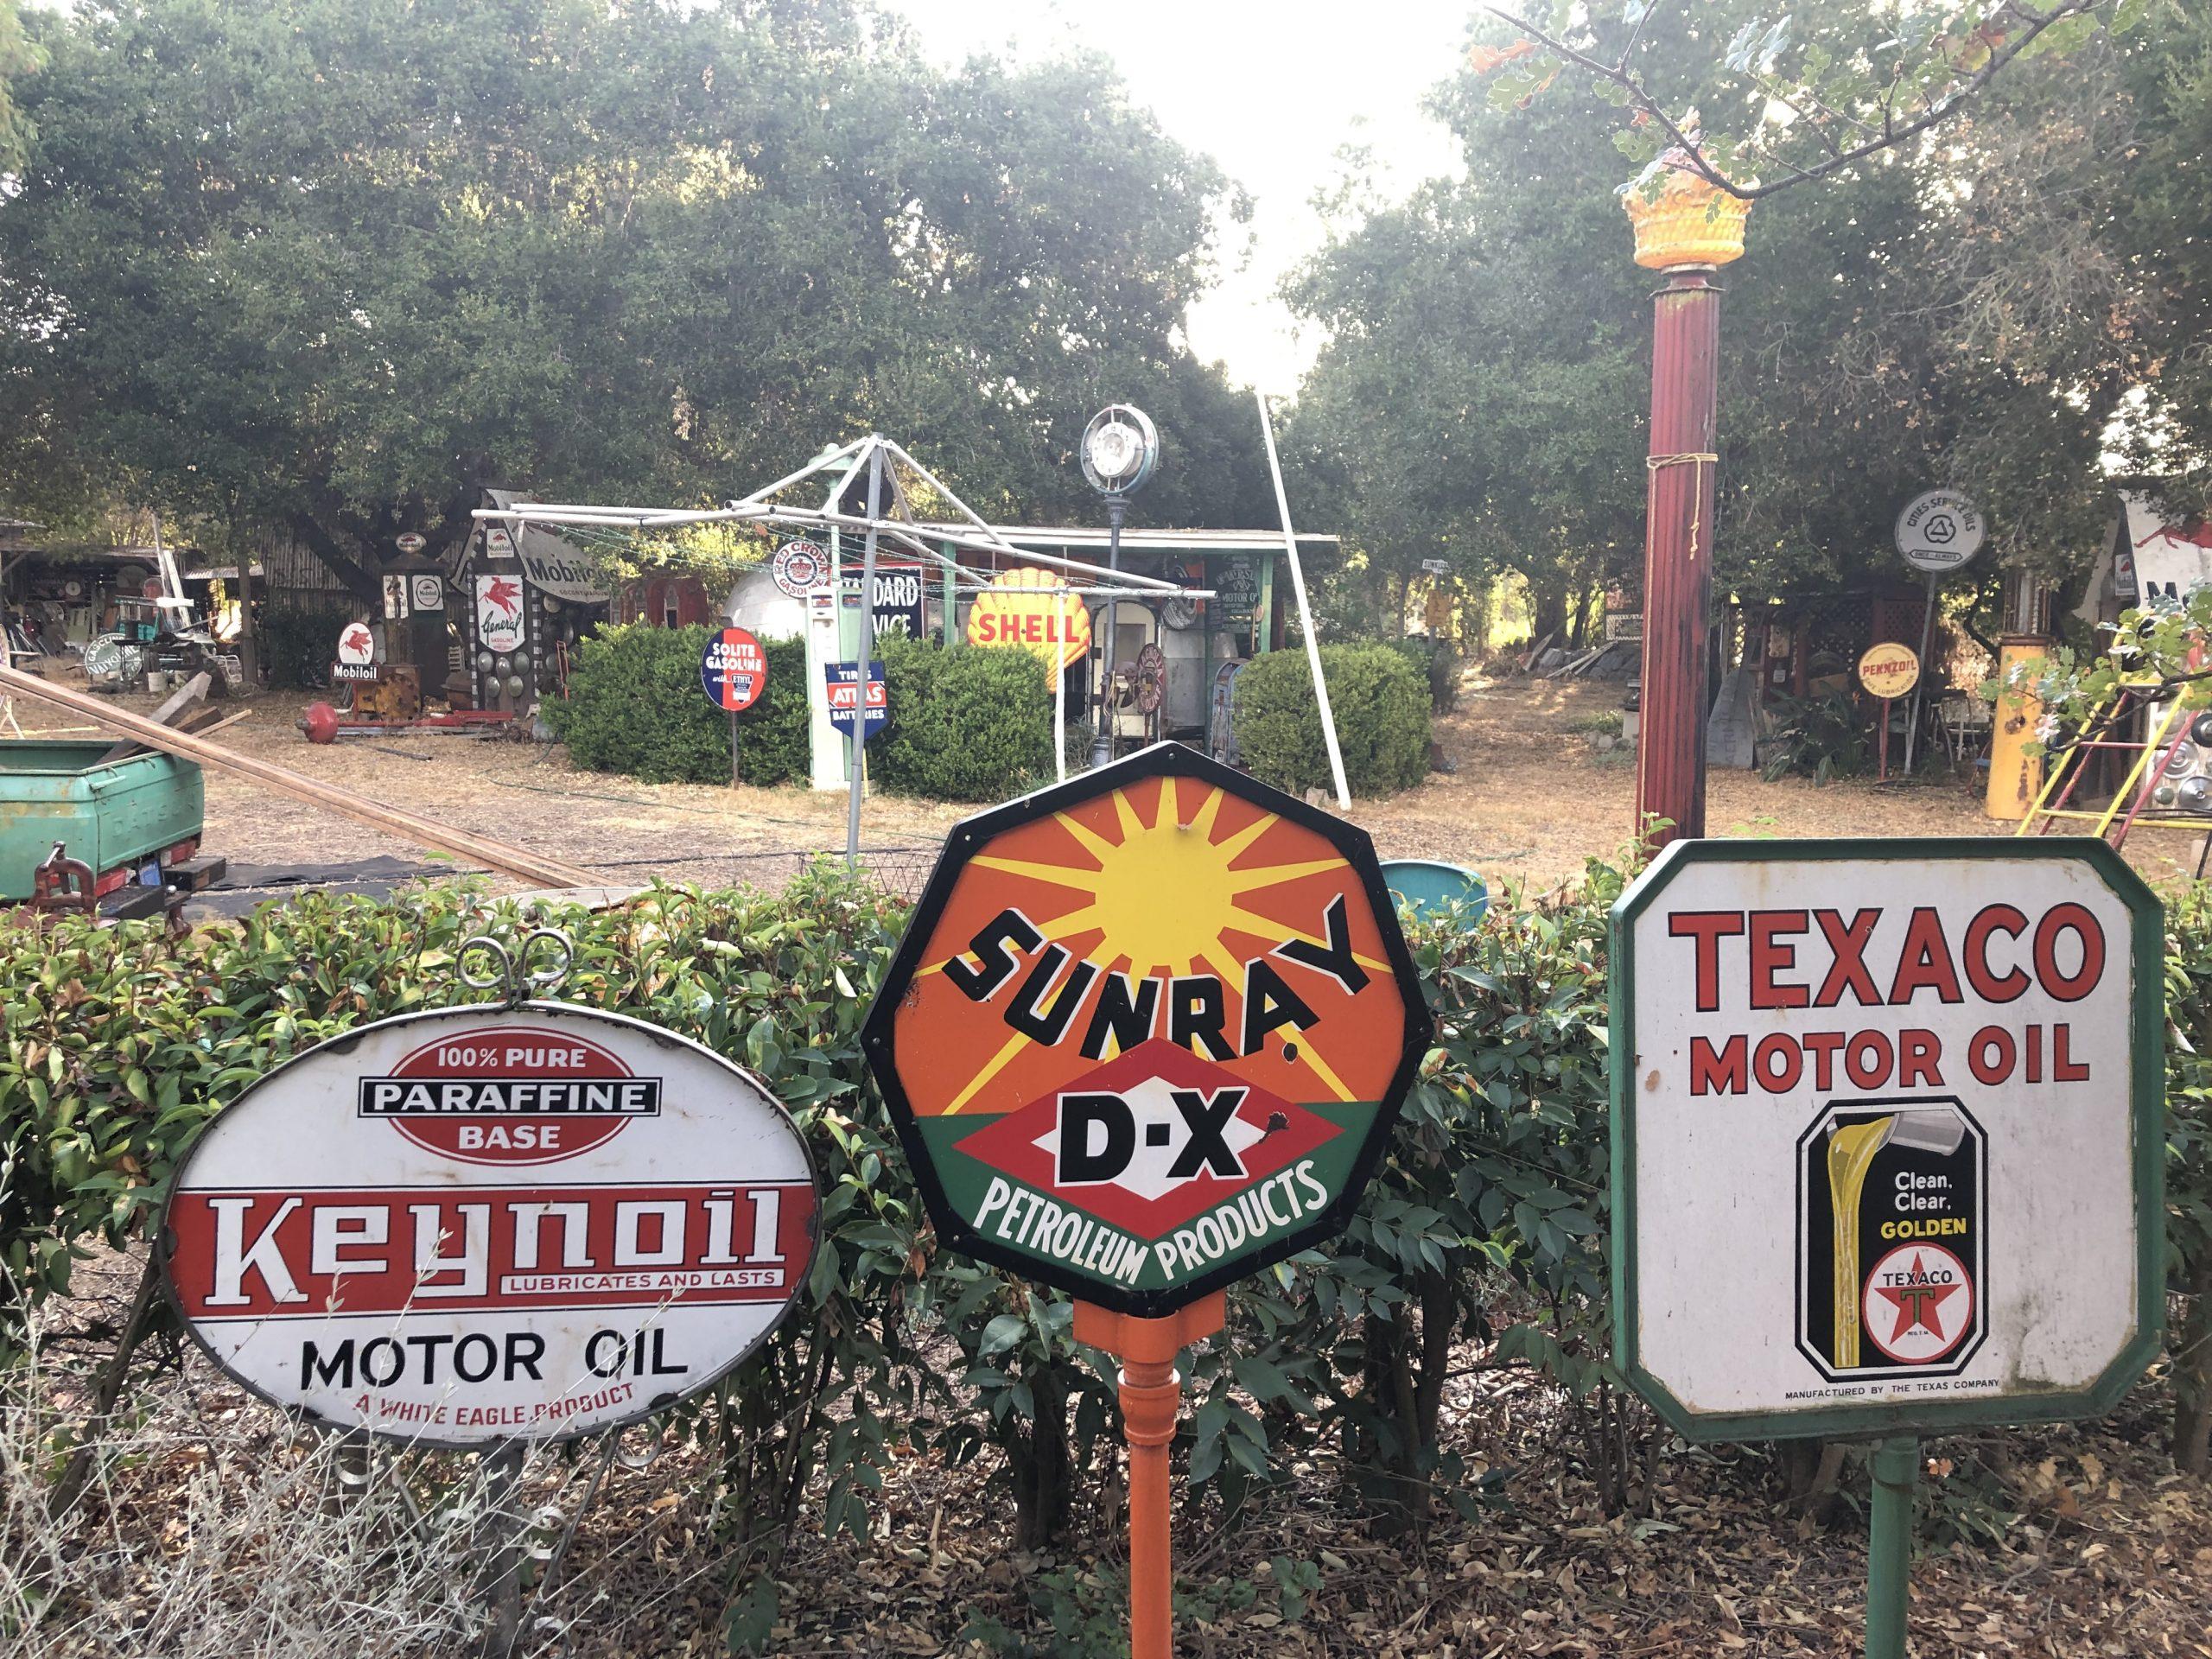 keynoil sunray texaco vintage oil signs in yard